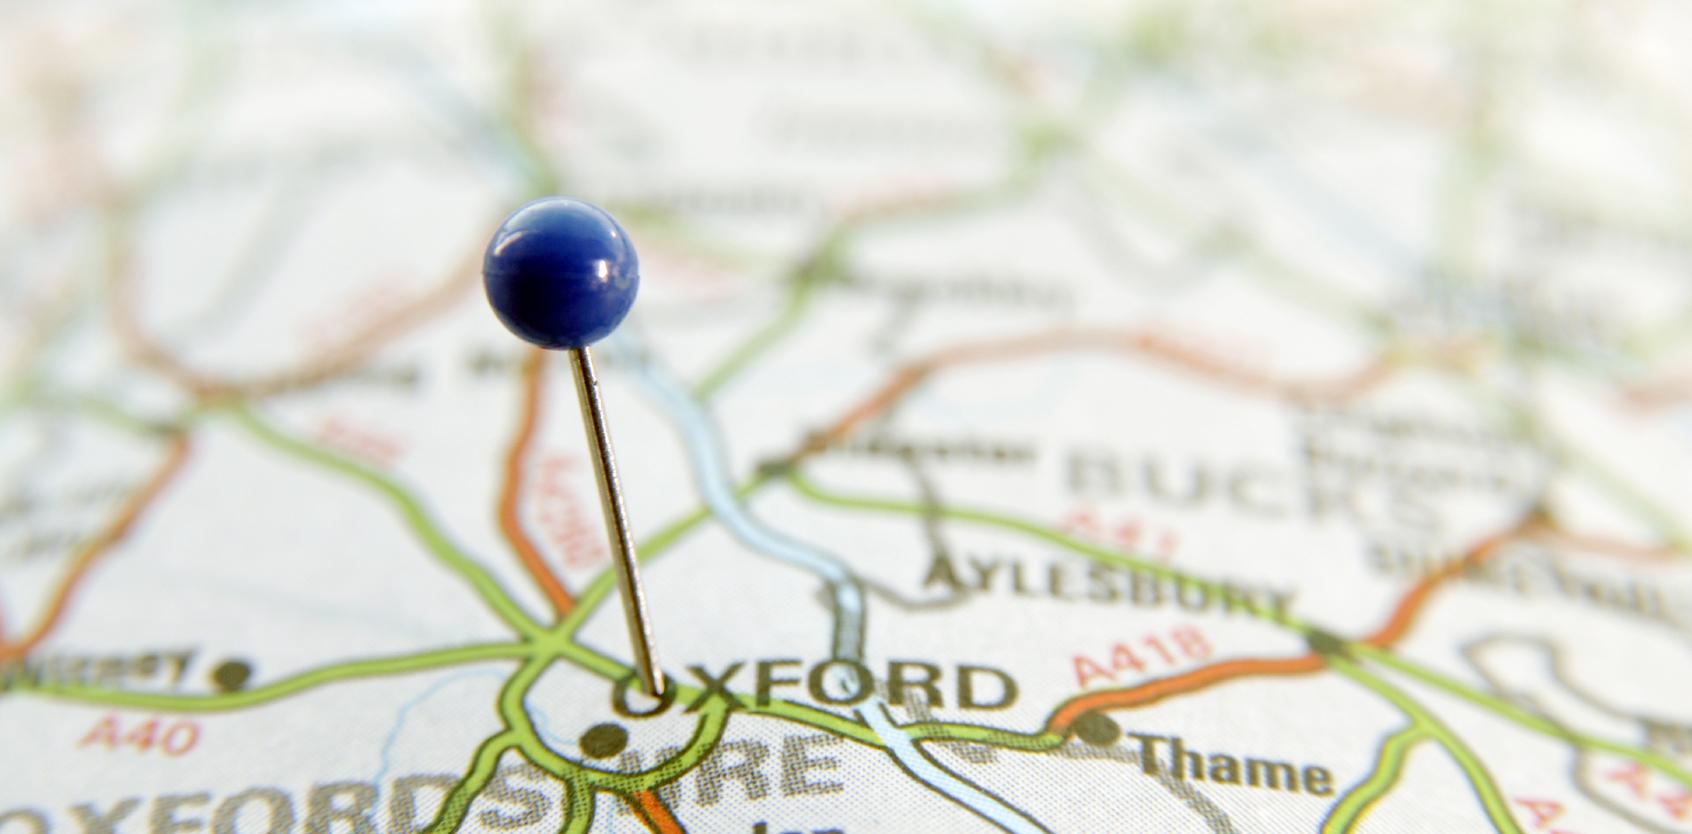 oxford-geo-tagging